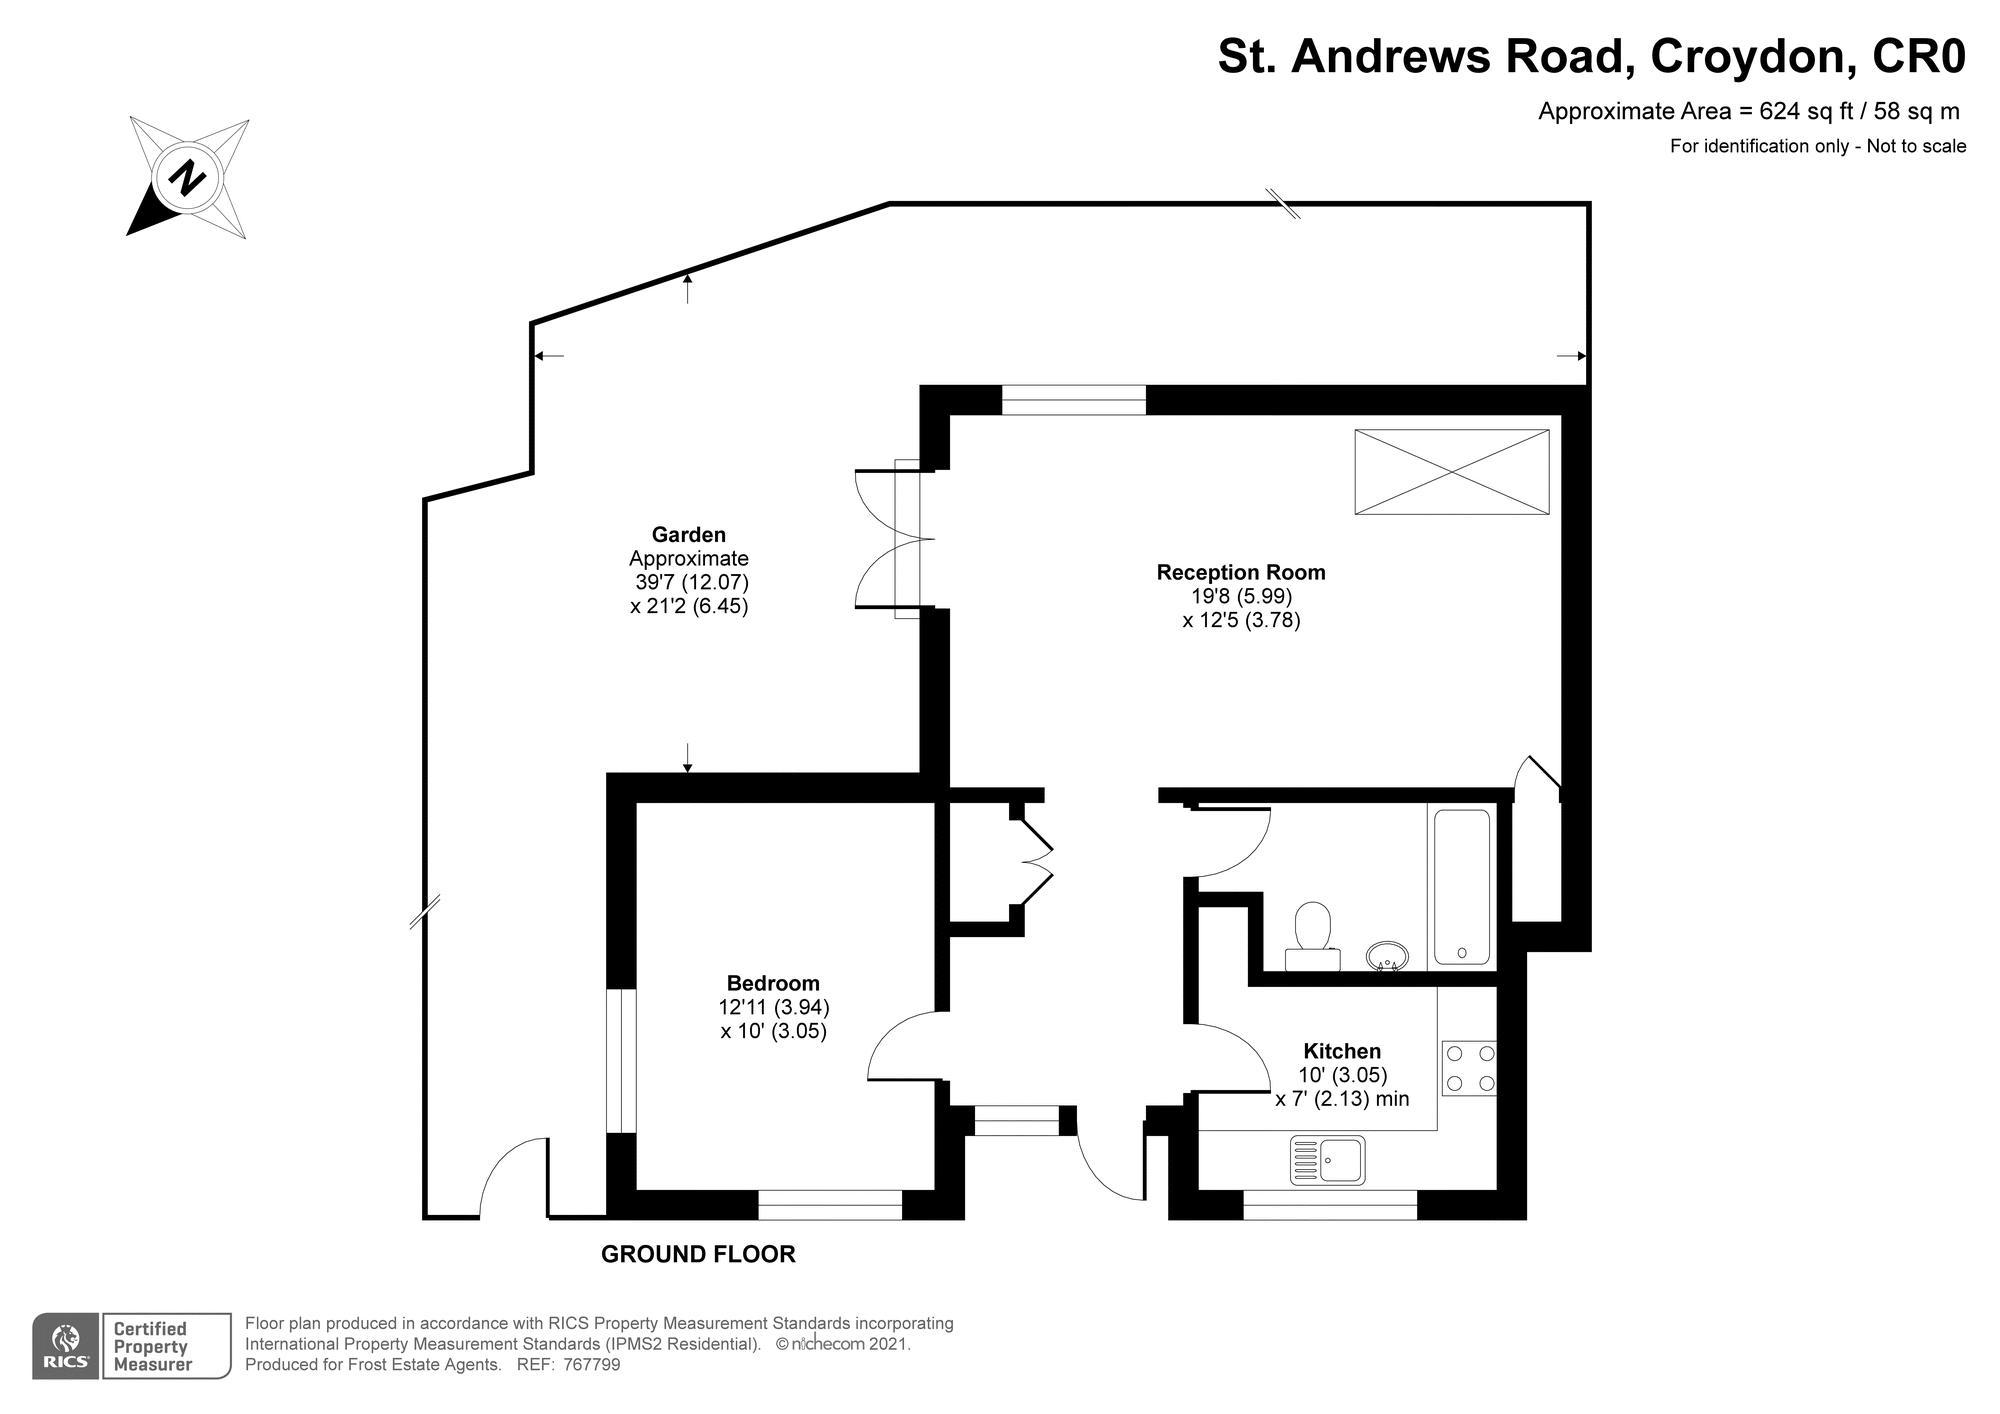 St. Andrews Road